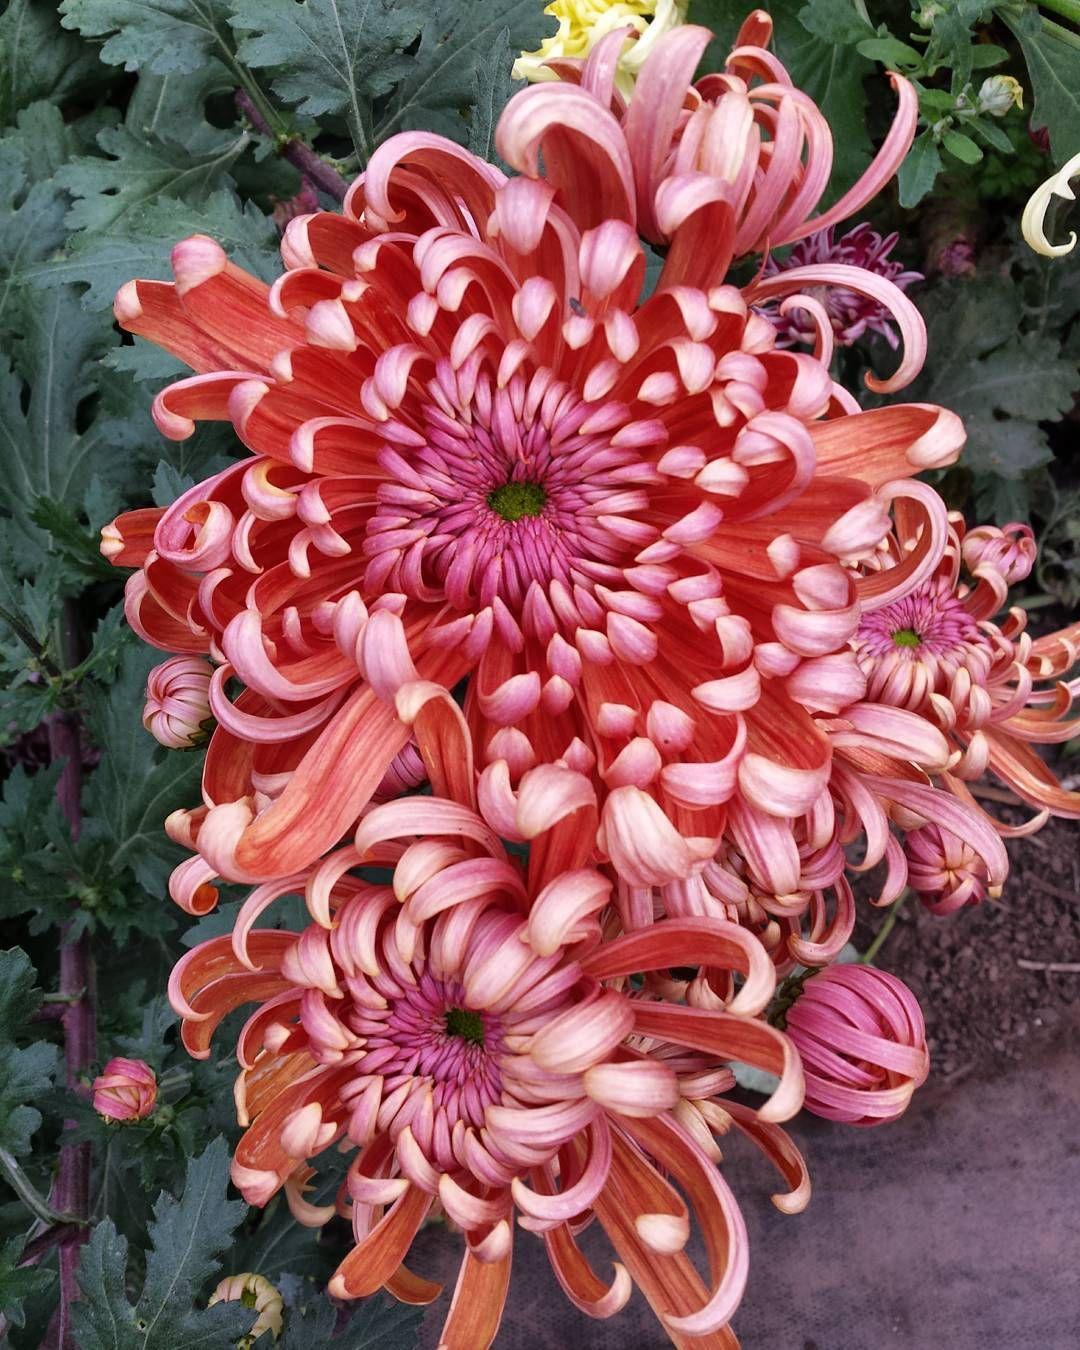 Elizabeth Bryant On Instagram River City Chrysanthemums Chrysanthemum Wedding Bouquet Chrysanthemum Flower Flowers Nature